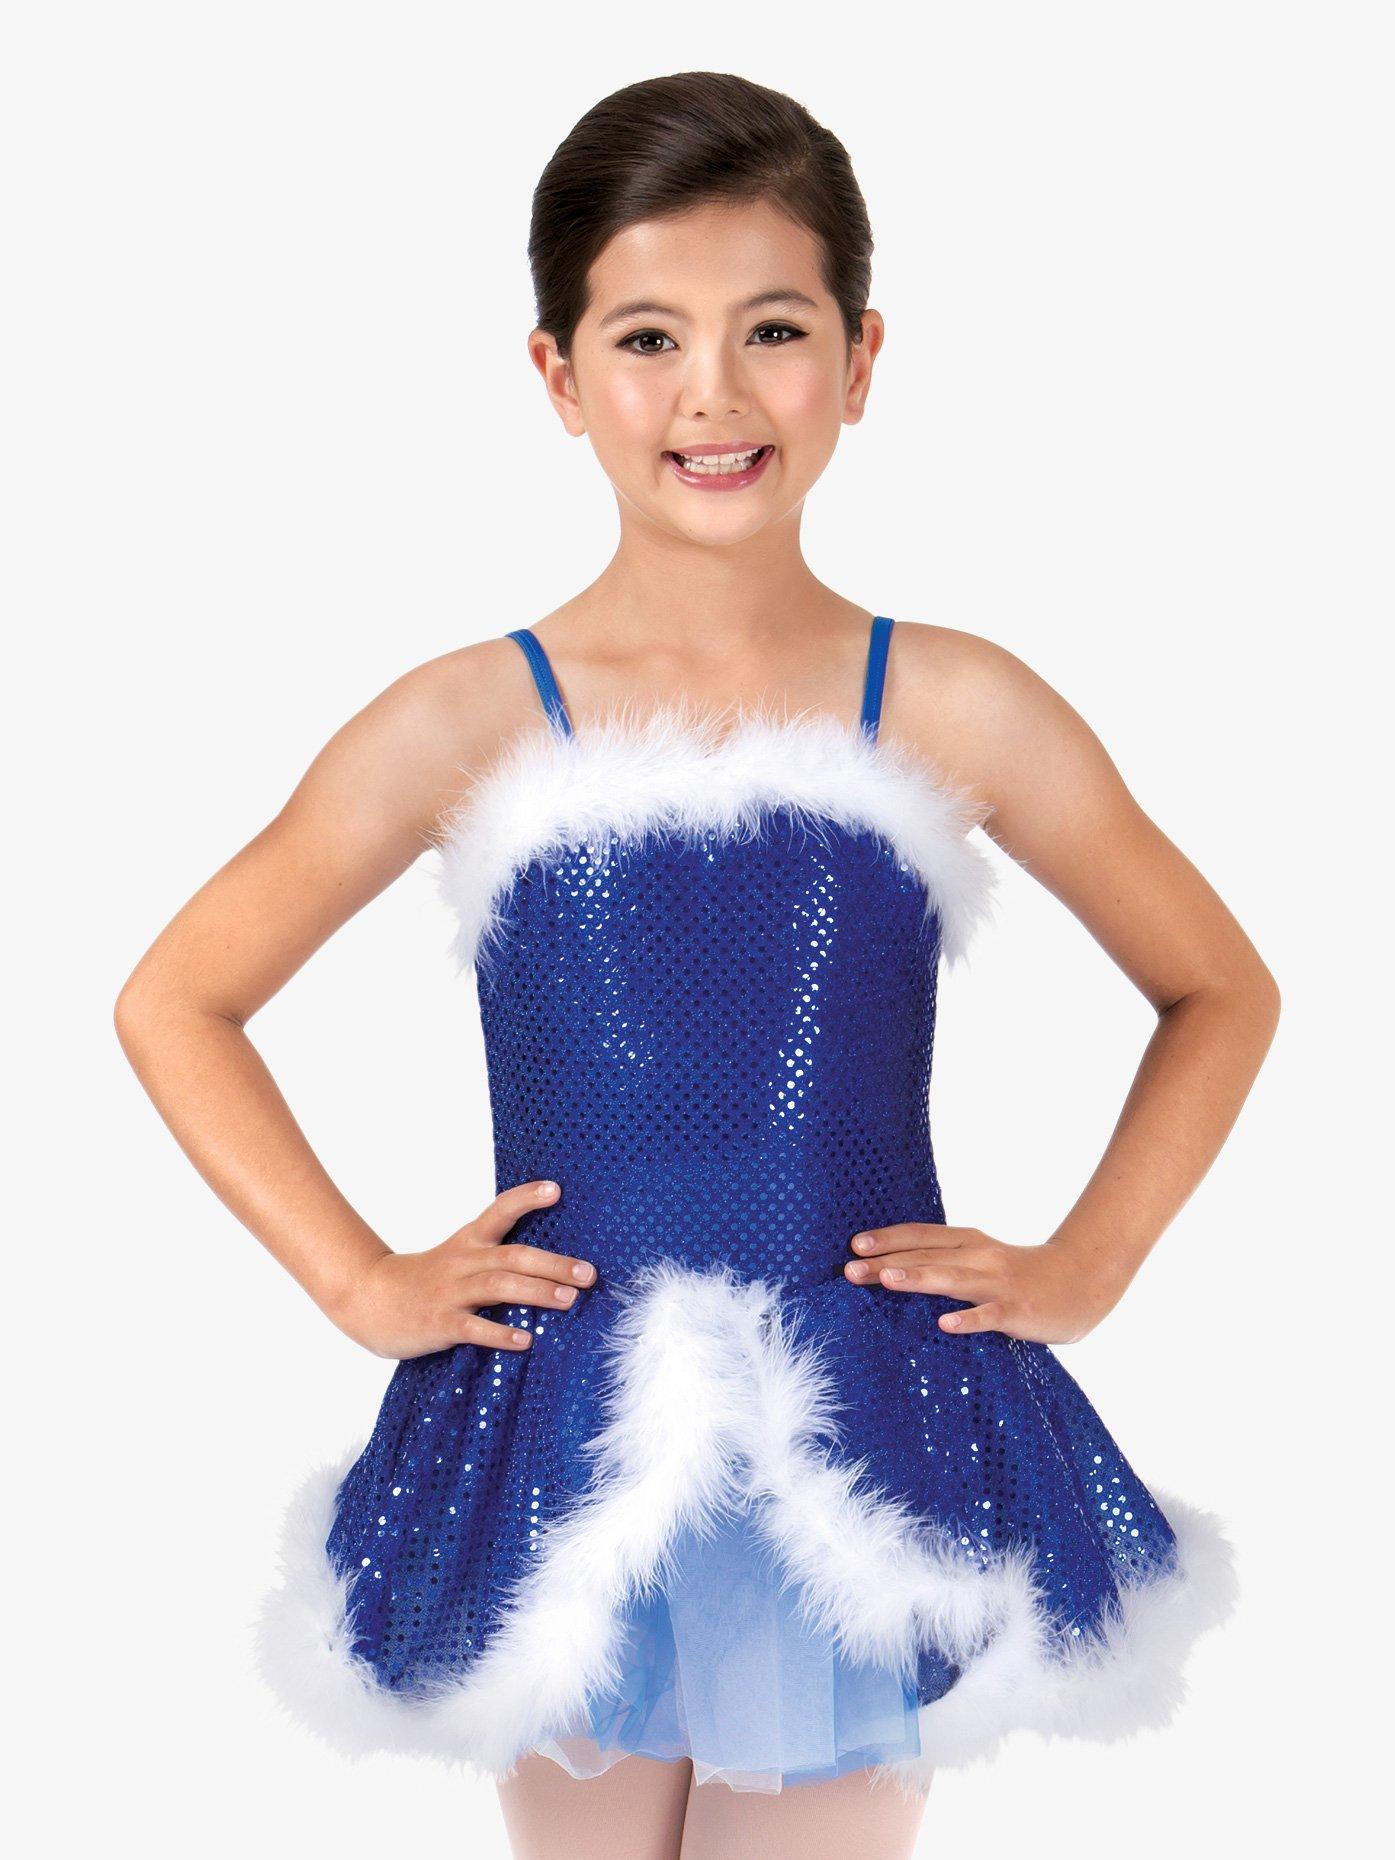 La Petite Ballerina Child Feather-Trimmed Sequin Camisole Costume Dress PB2000C